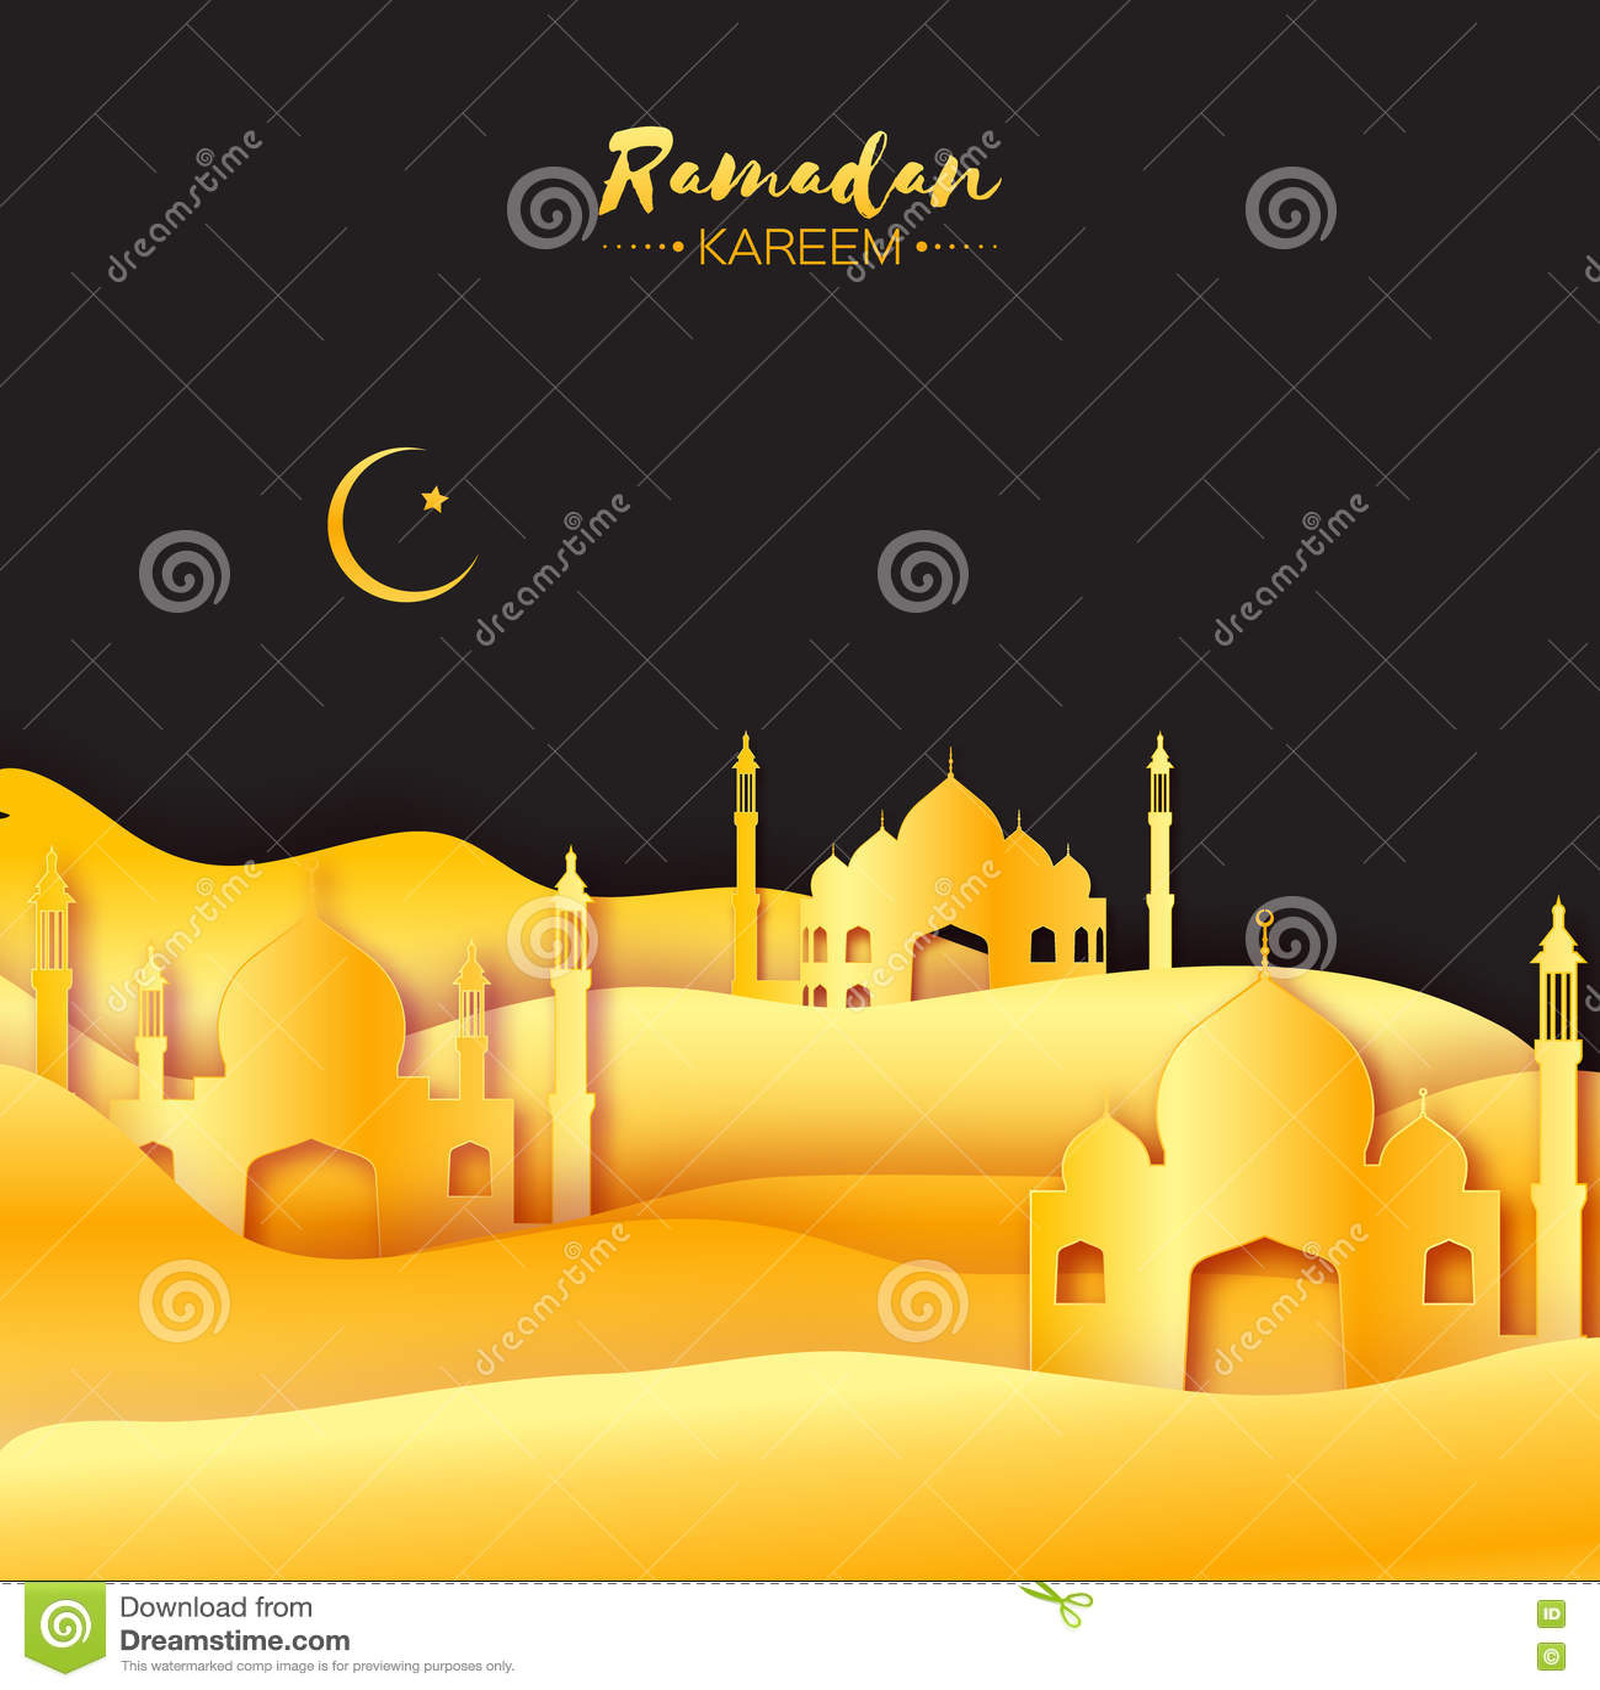 essay on the month of ramadan An essay on ramadan month for students, kids and children given here hindi, english, urdu, arabic, long essay, marathi, short essay, oriya, punjabi, gujarati, & more ramadan (sometimes.